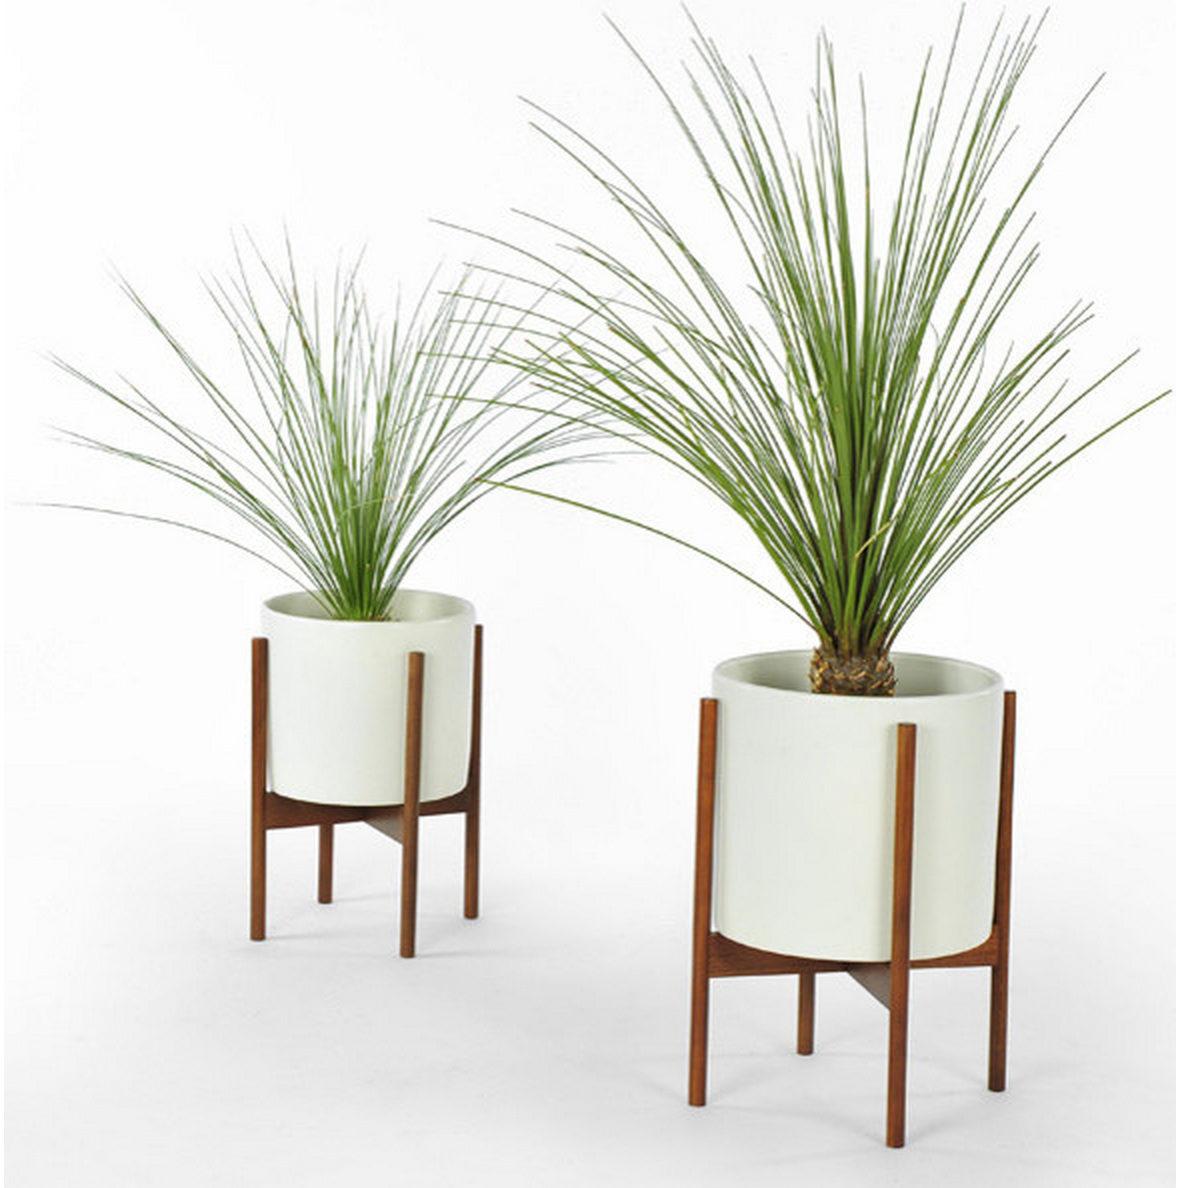 Floor plants | Planters Inspiration #scadpad | Pinterest | Floor ...